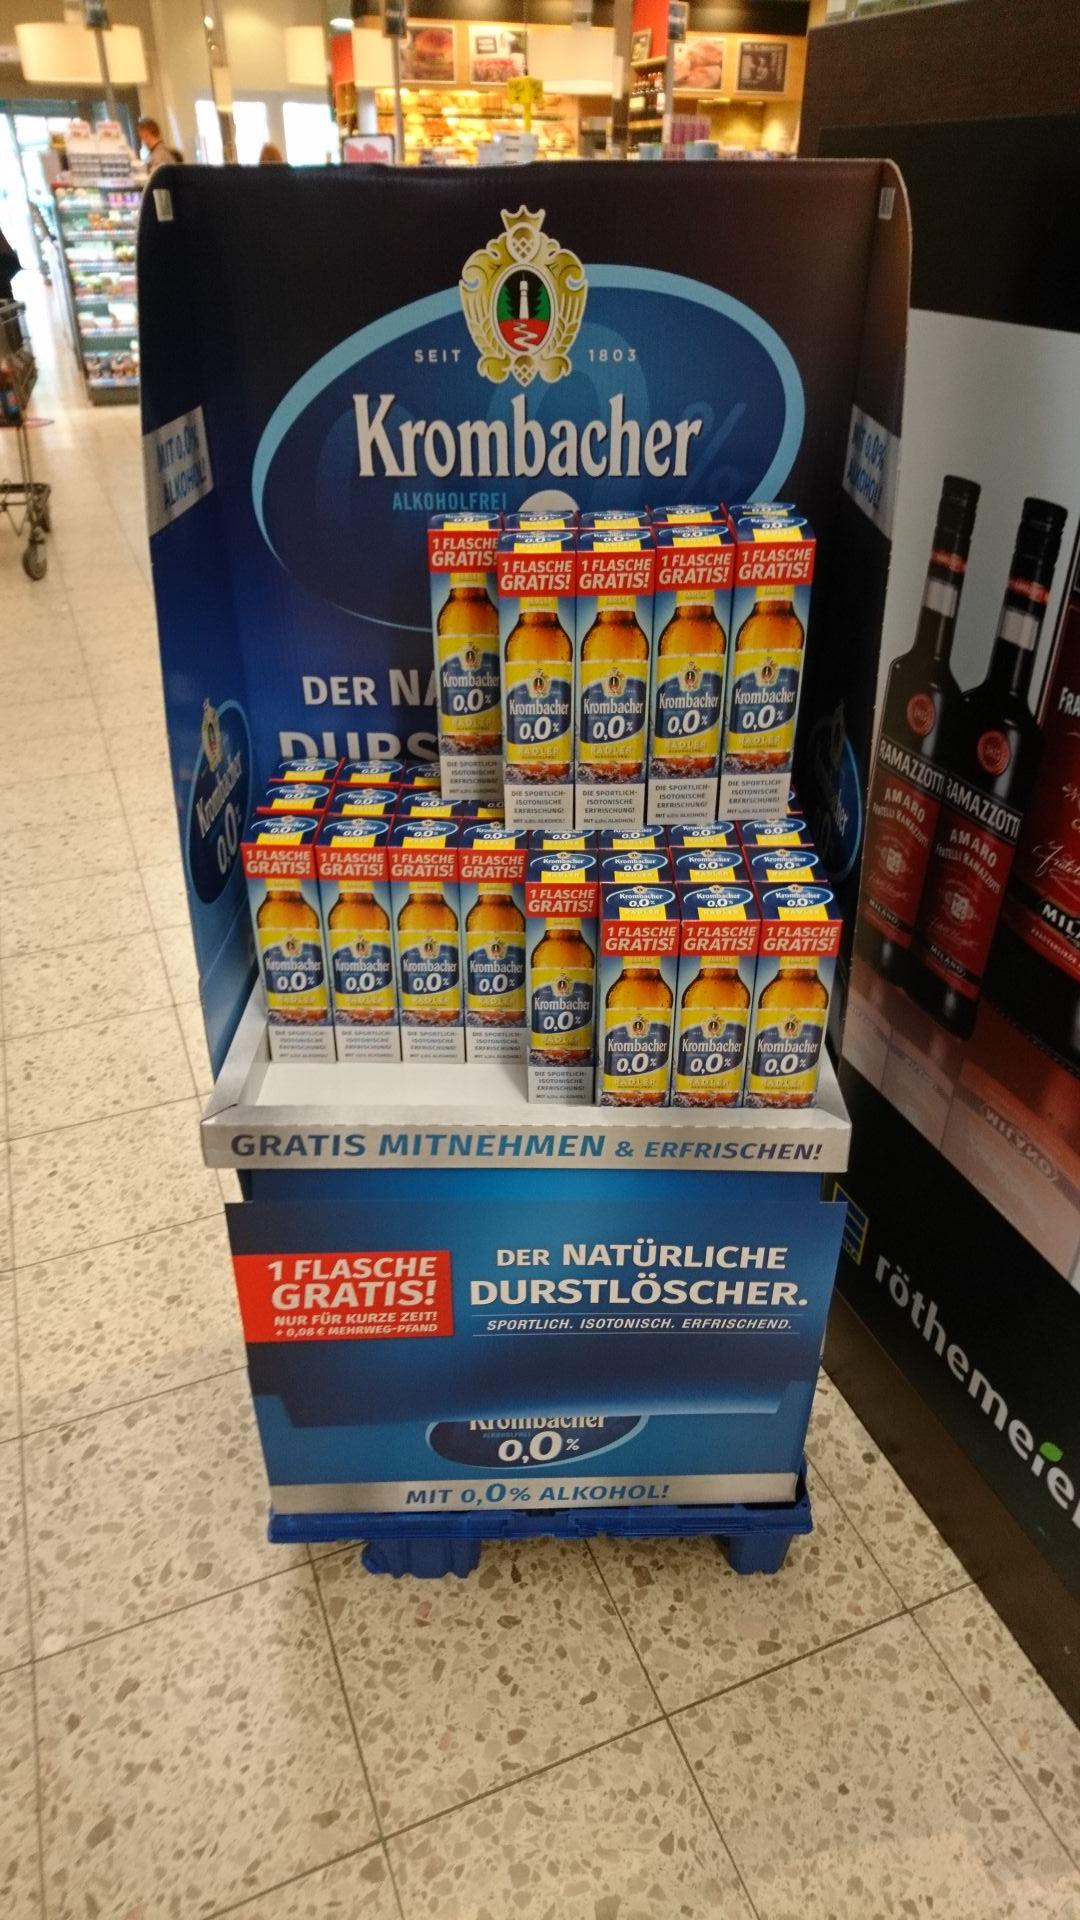 [EDEKA Röthemeier, Minden] Krombacher Alkoholfrei 0,0% Radler Gratis (+ 8 Cent Pfand)